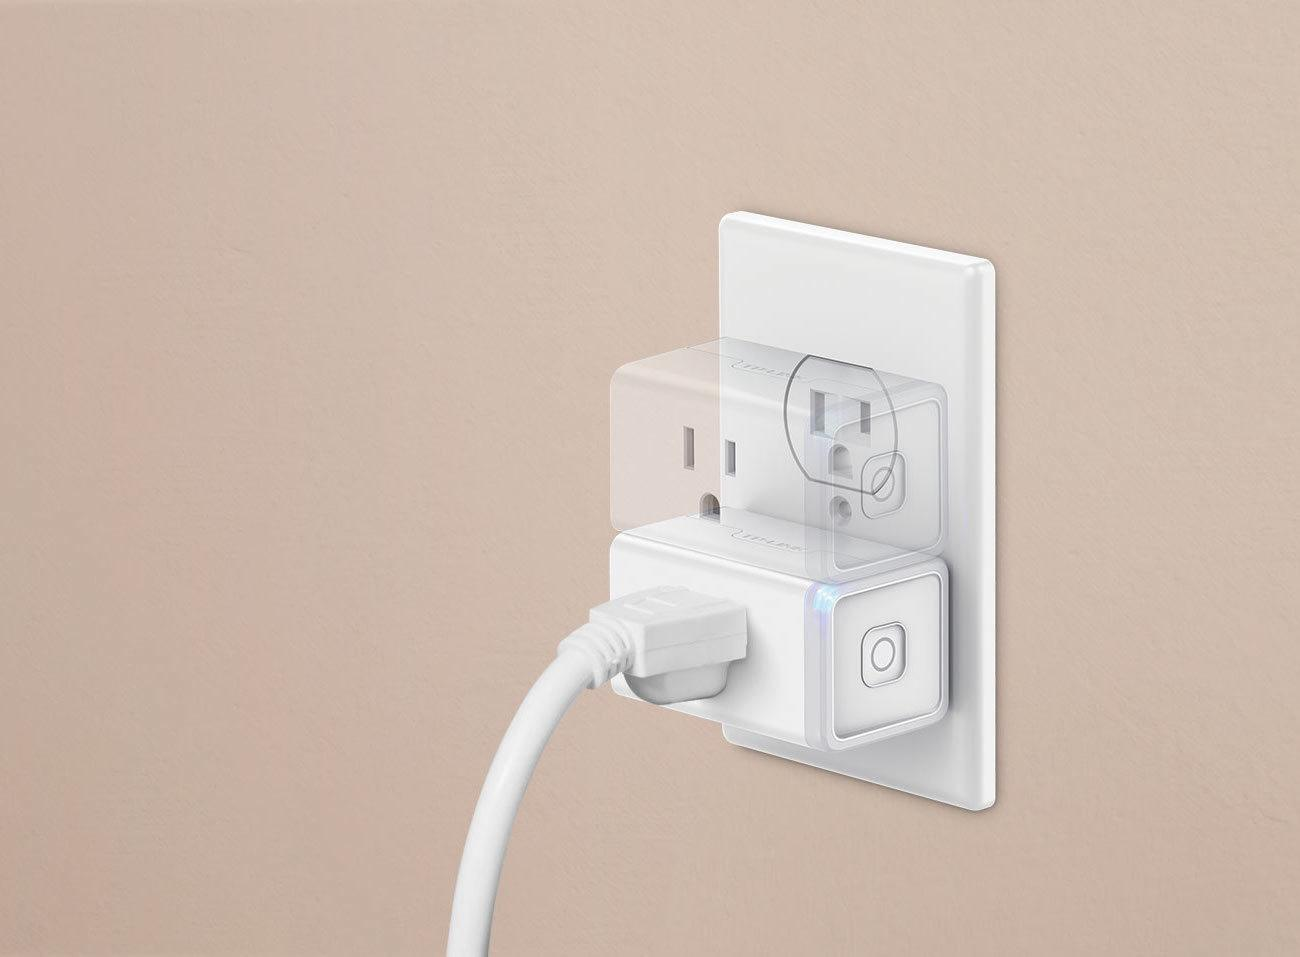 TP-Link Smart Plug Mini — Frillstash